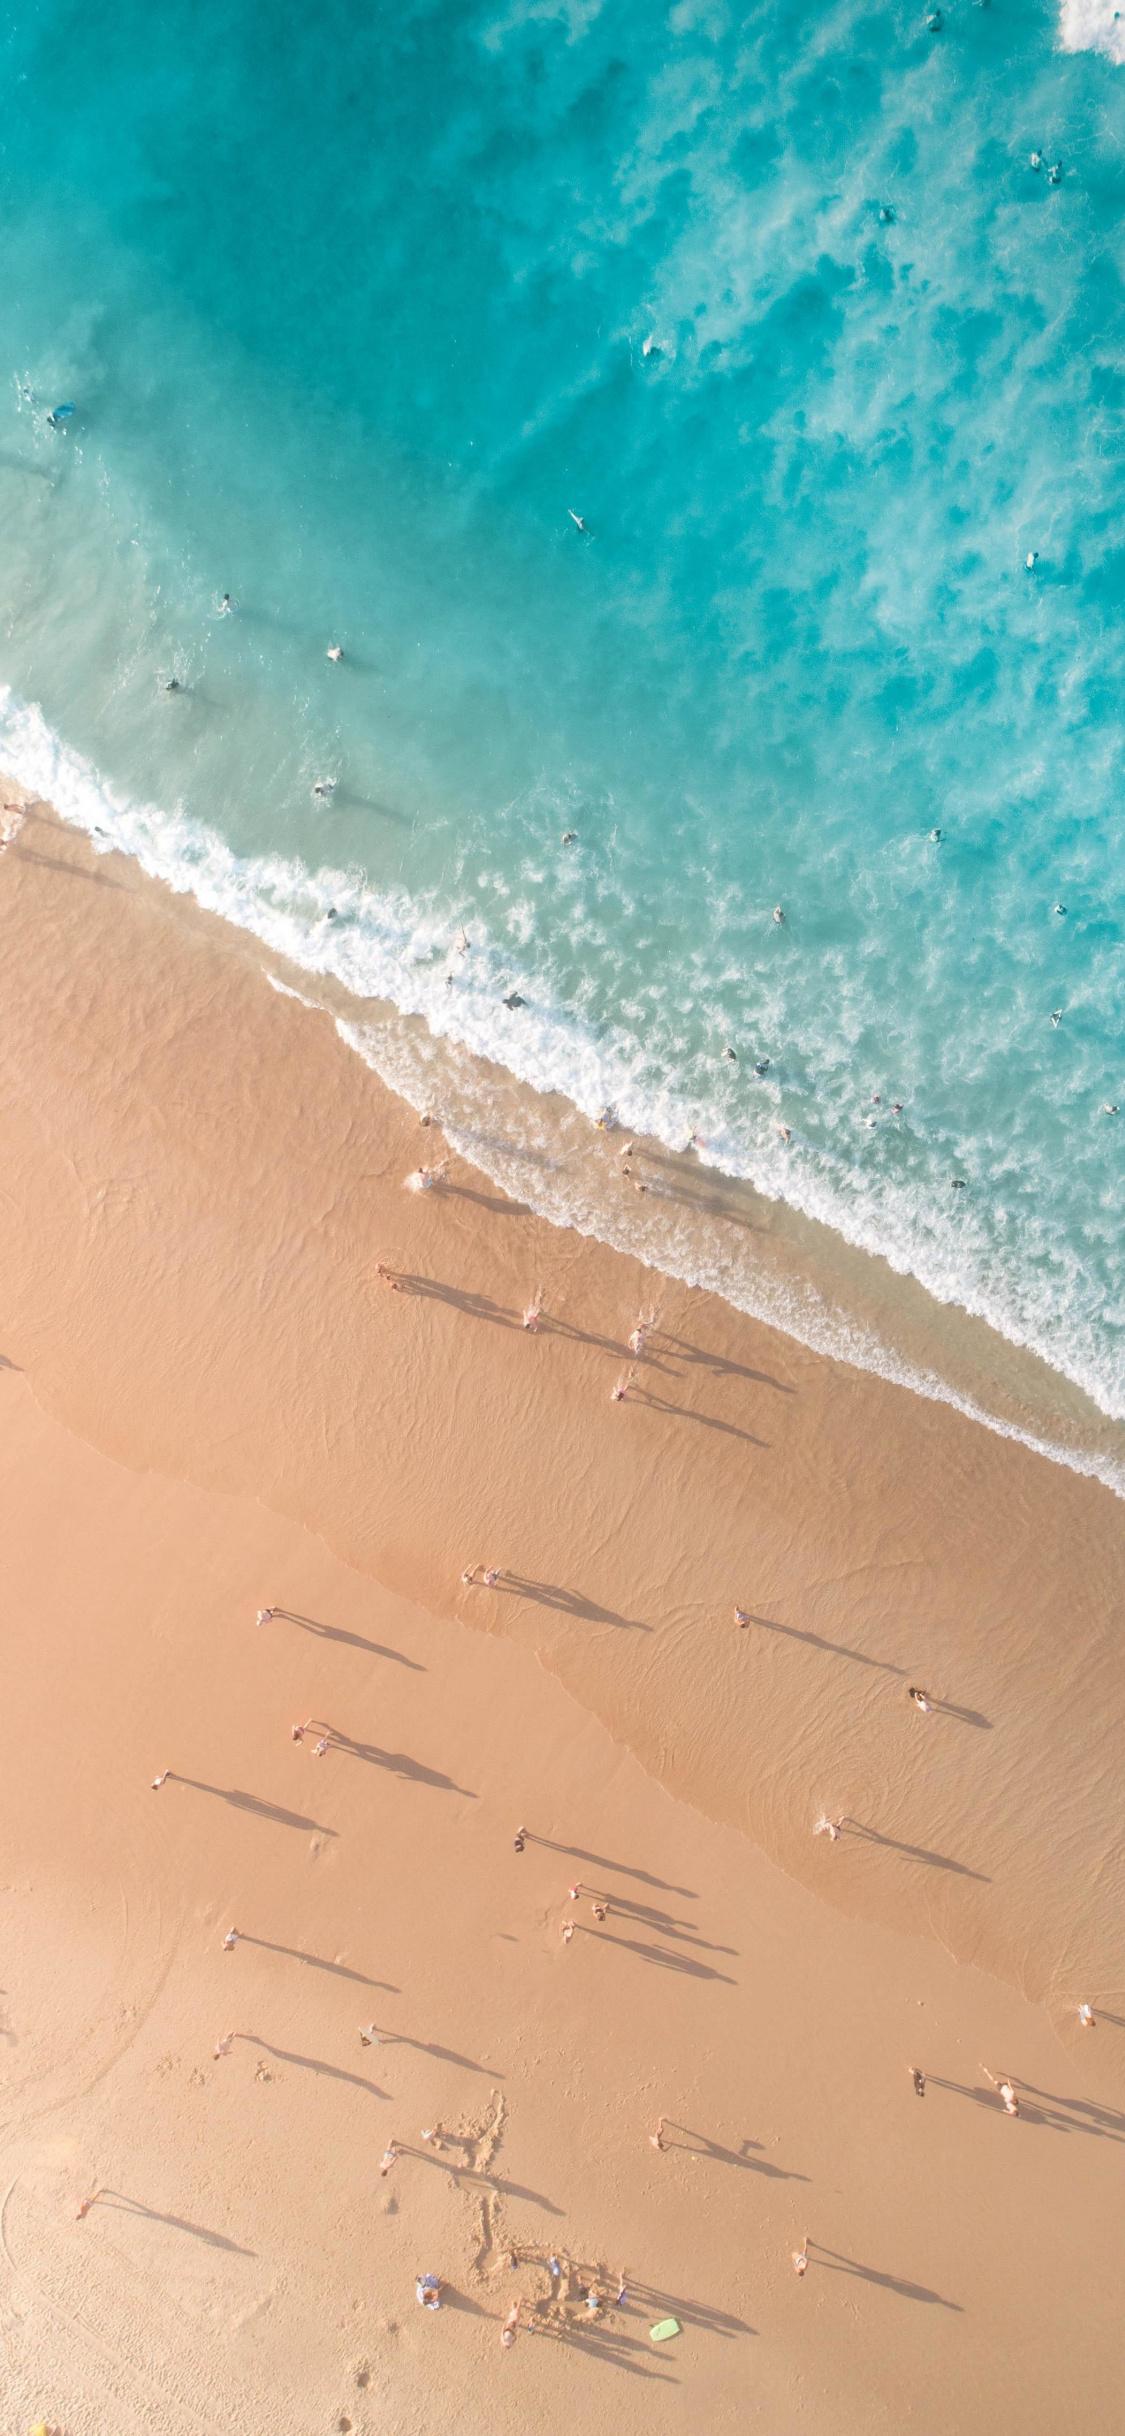 Aerial View, Calm And Peaceful Beach, Nature, Summer, - Iphone Wallpaper Ocean - HD Wallpaper